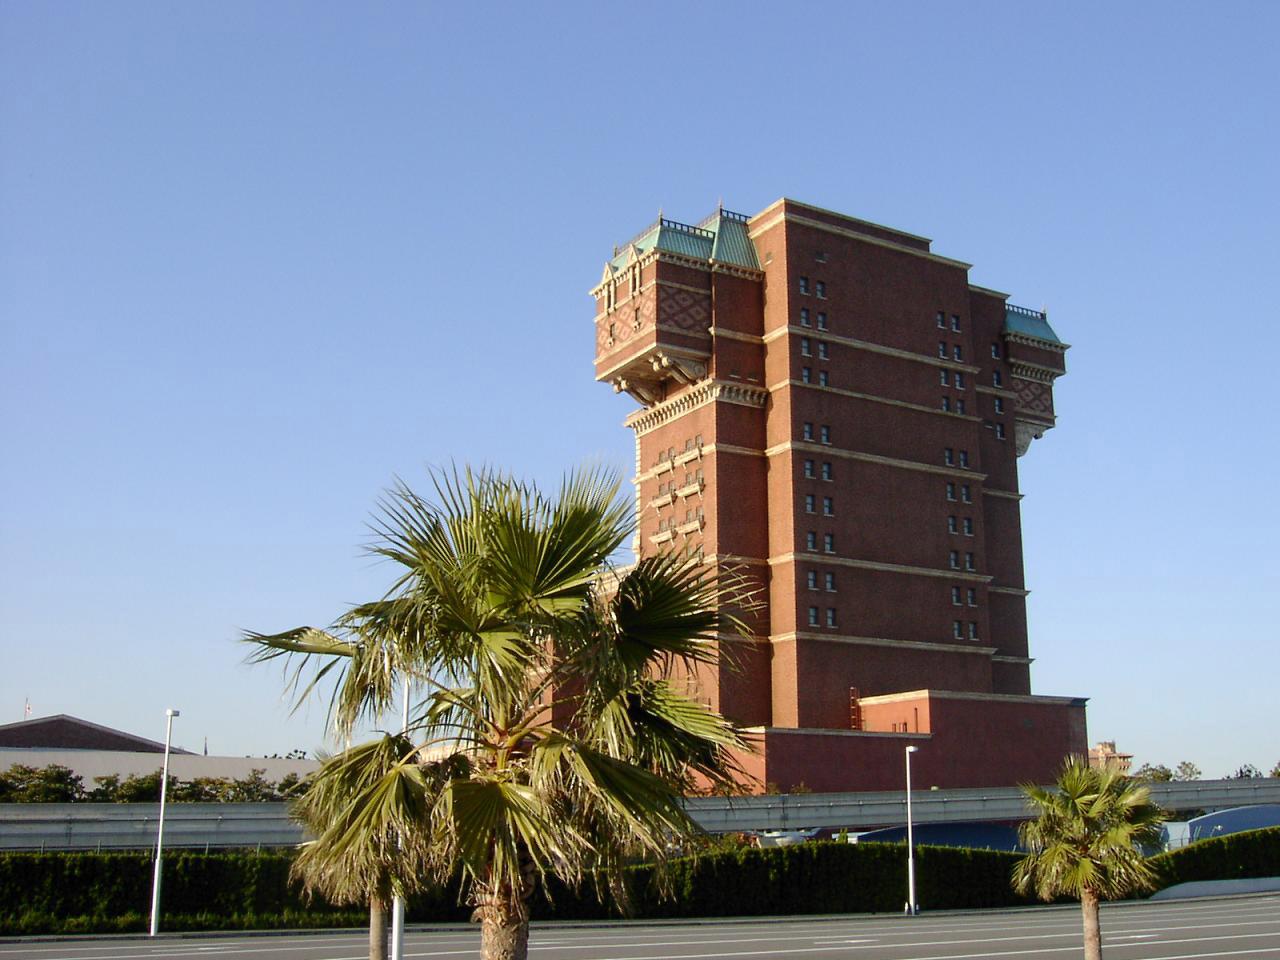 tokyo_disneysea_tower_of_terror_back_side